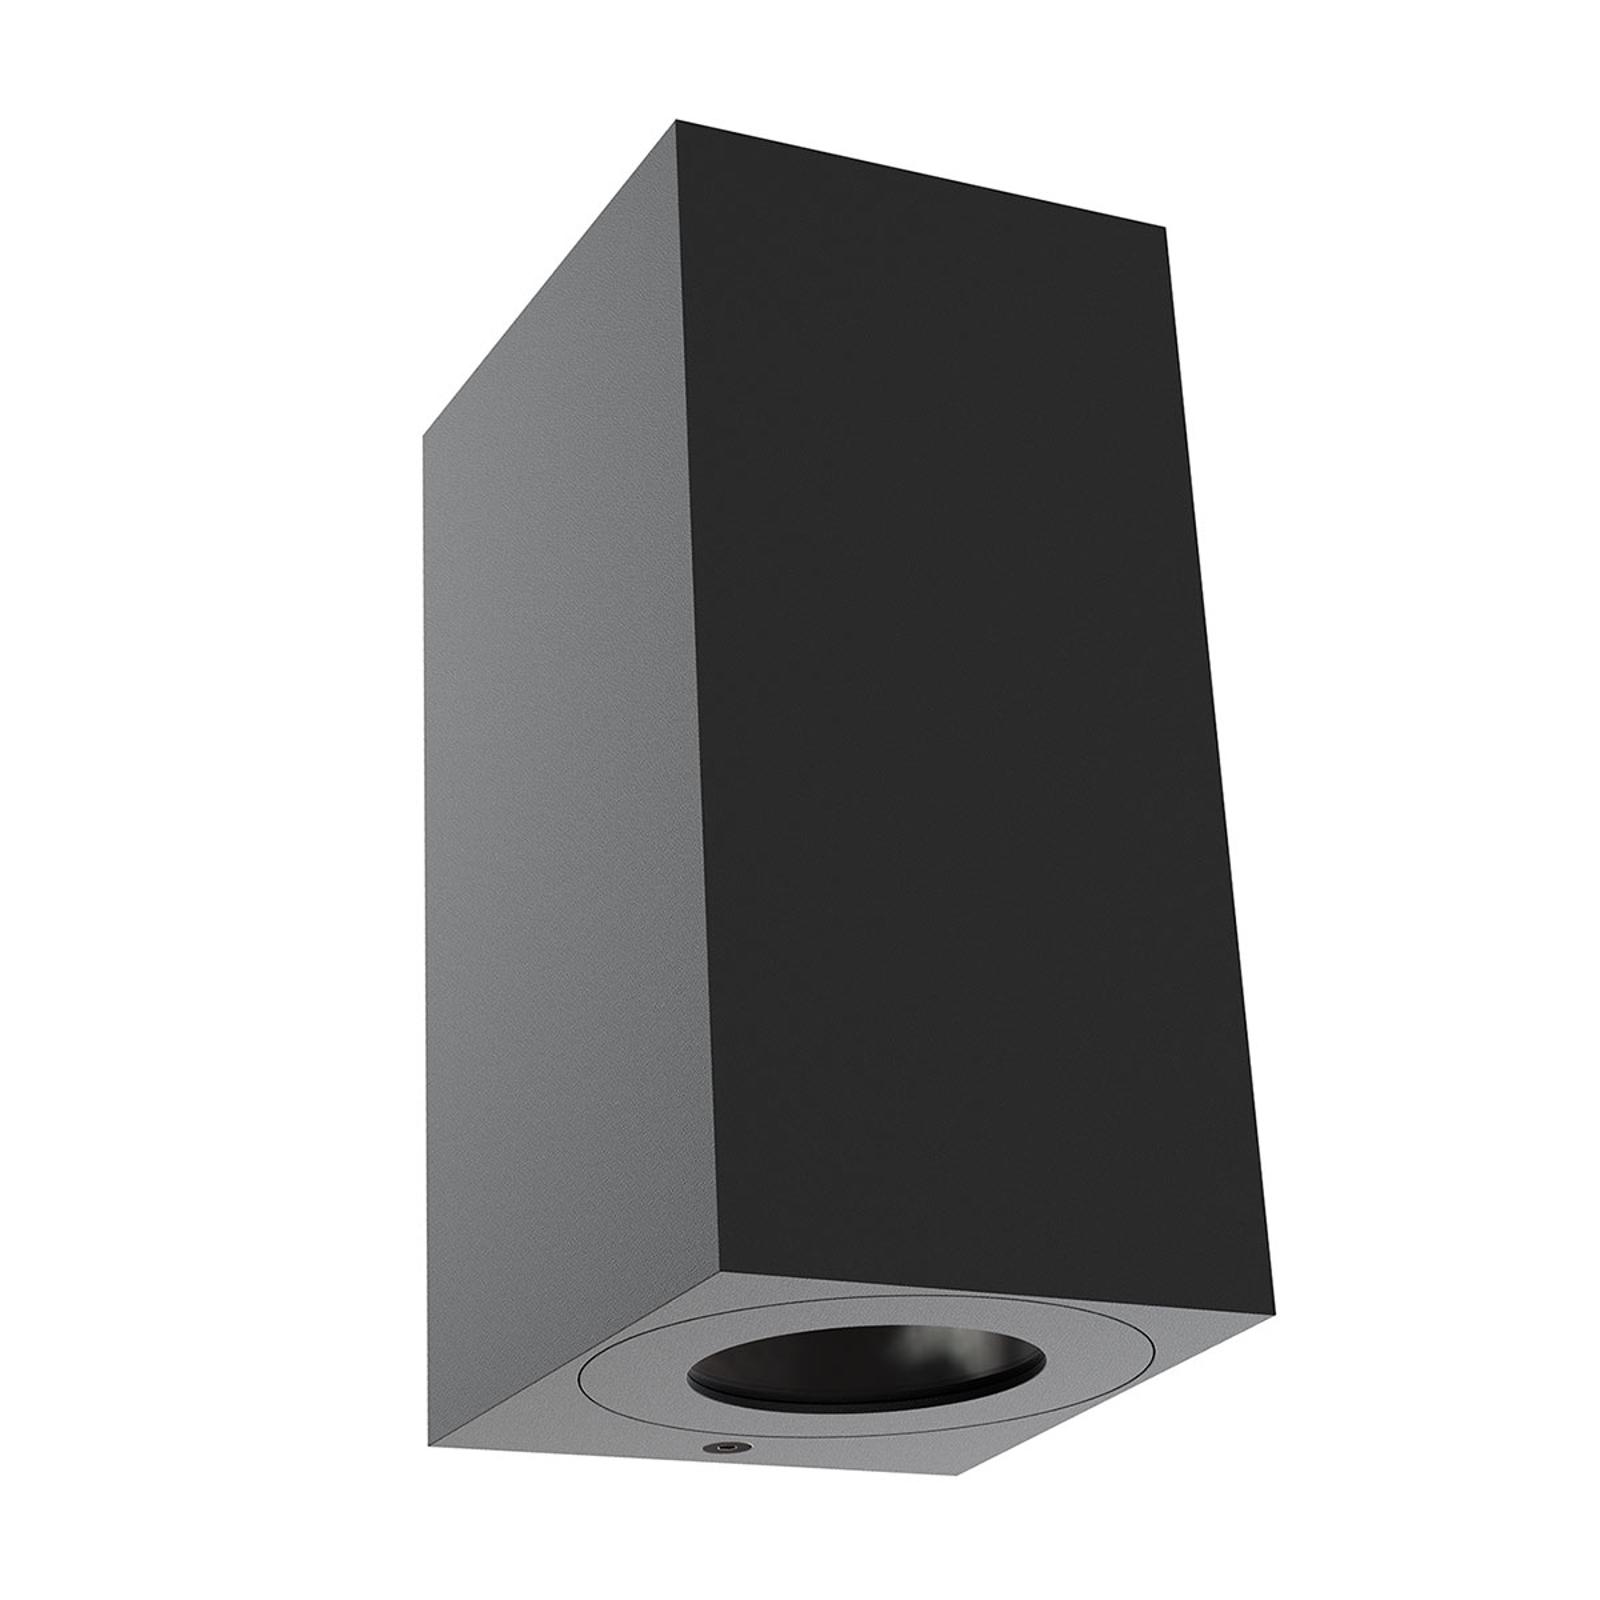 Buitenwandlamp Canto Maxi Kubi 2, 17 cm, zwart